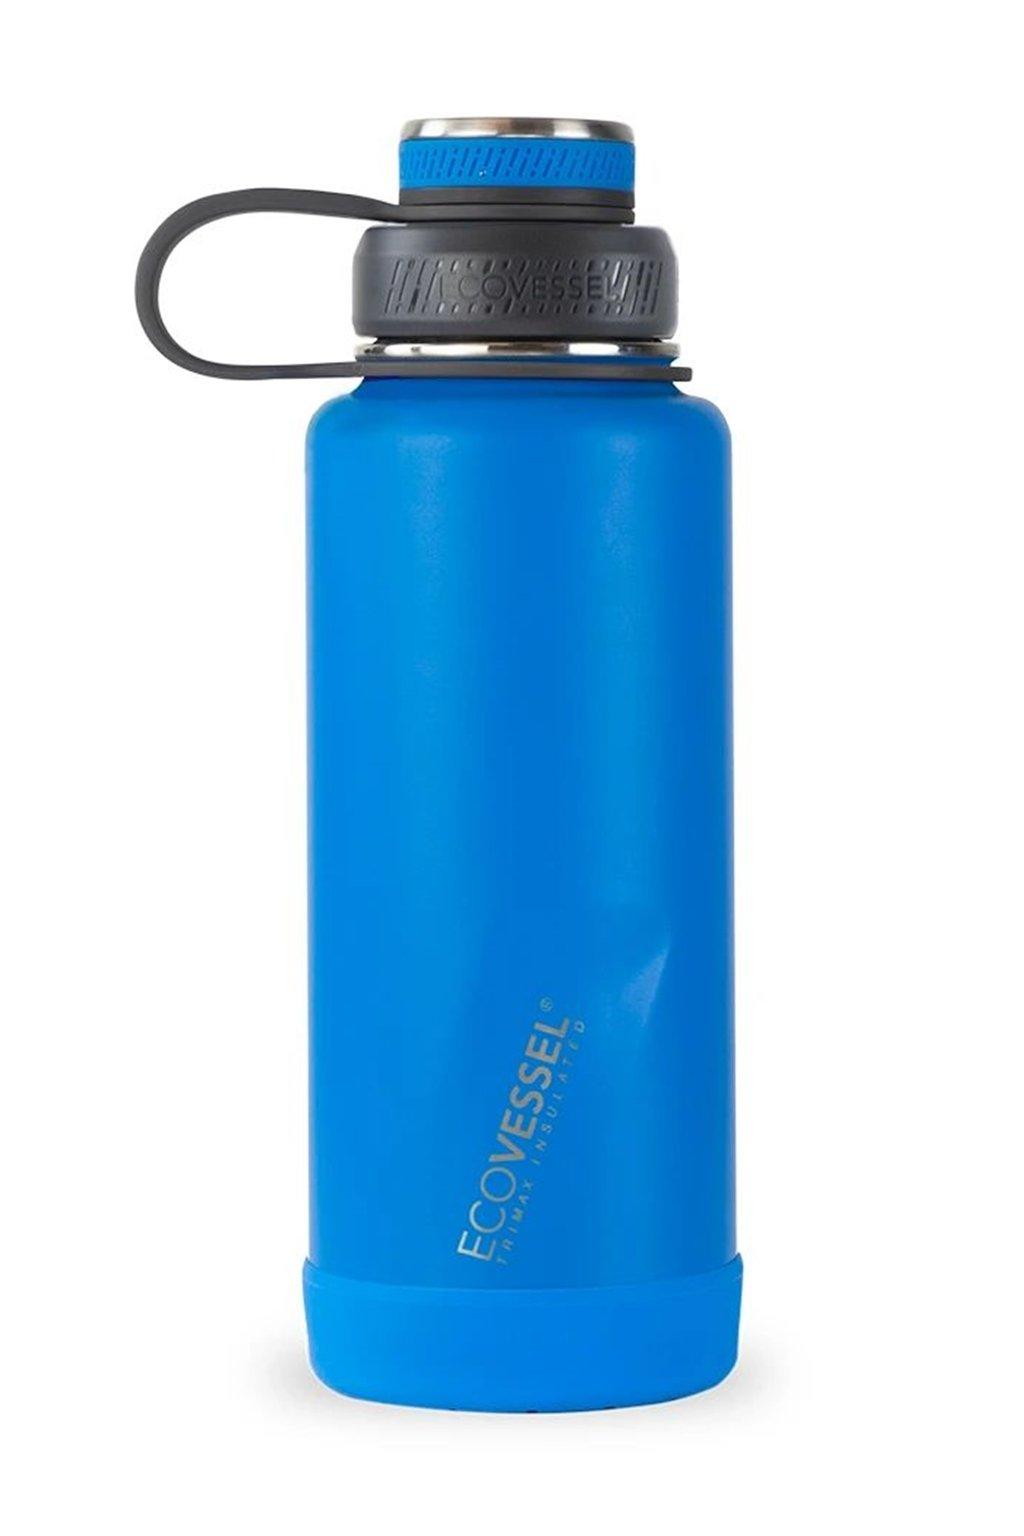 Termoska 1L Eco Vessel vakuova modra